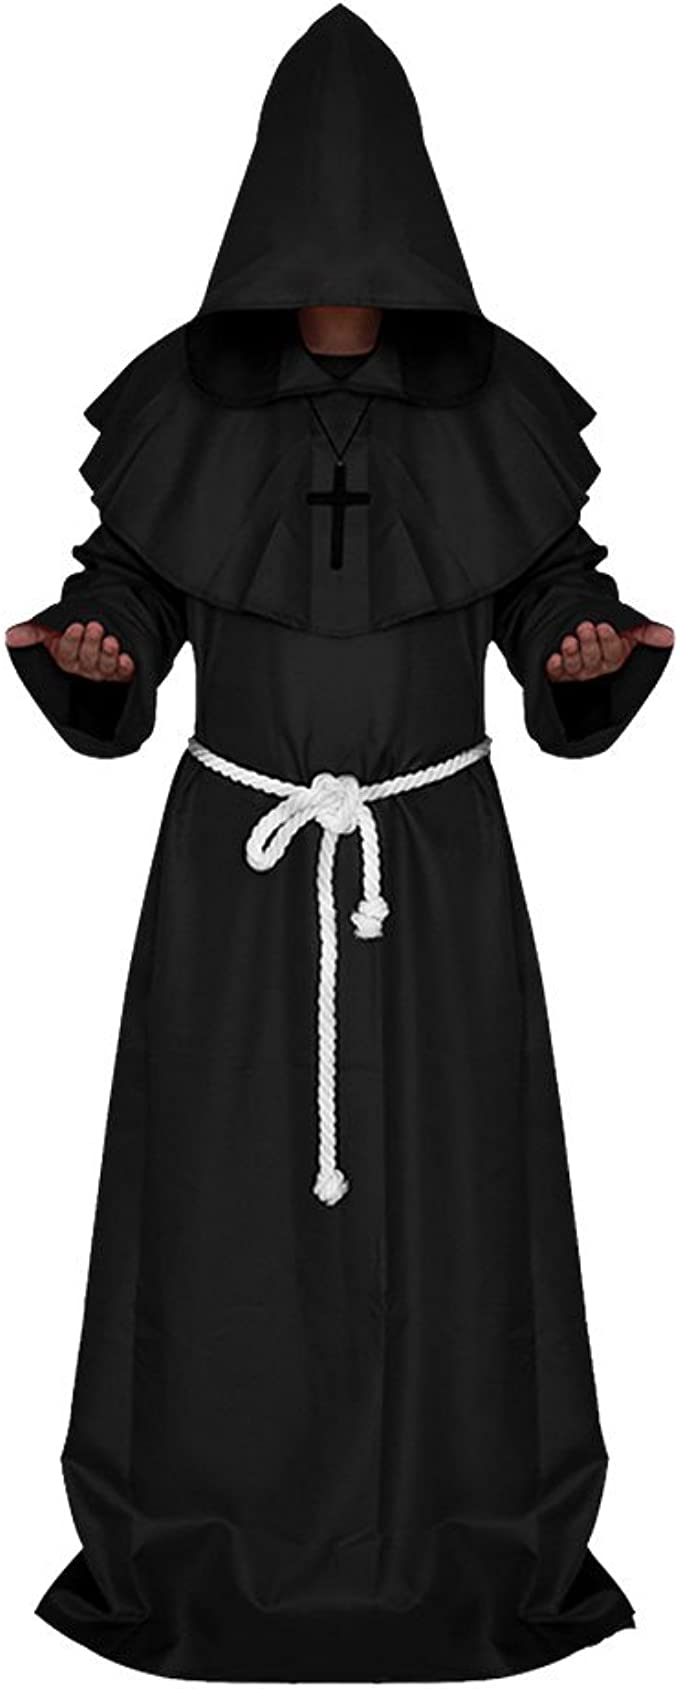 Comficent Halloween Disfraz de Monje Adulto Sacerdote Túnica ...